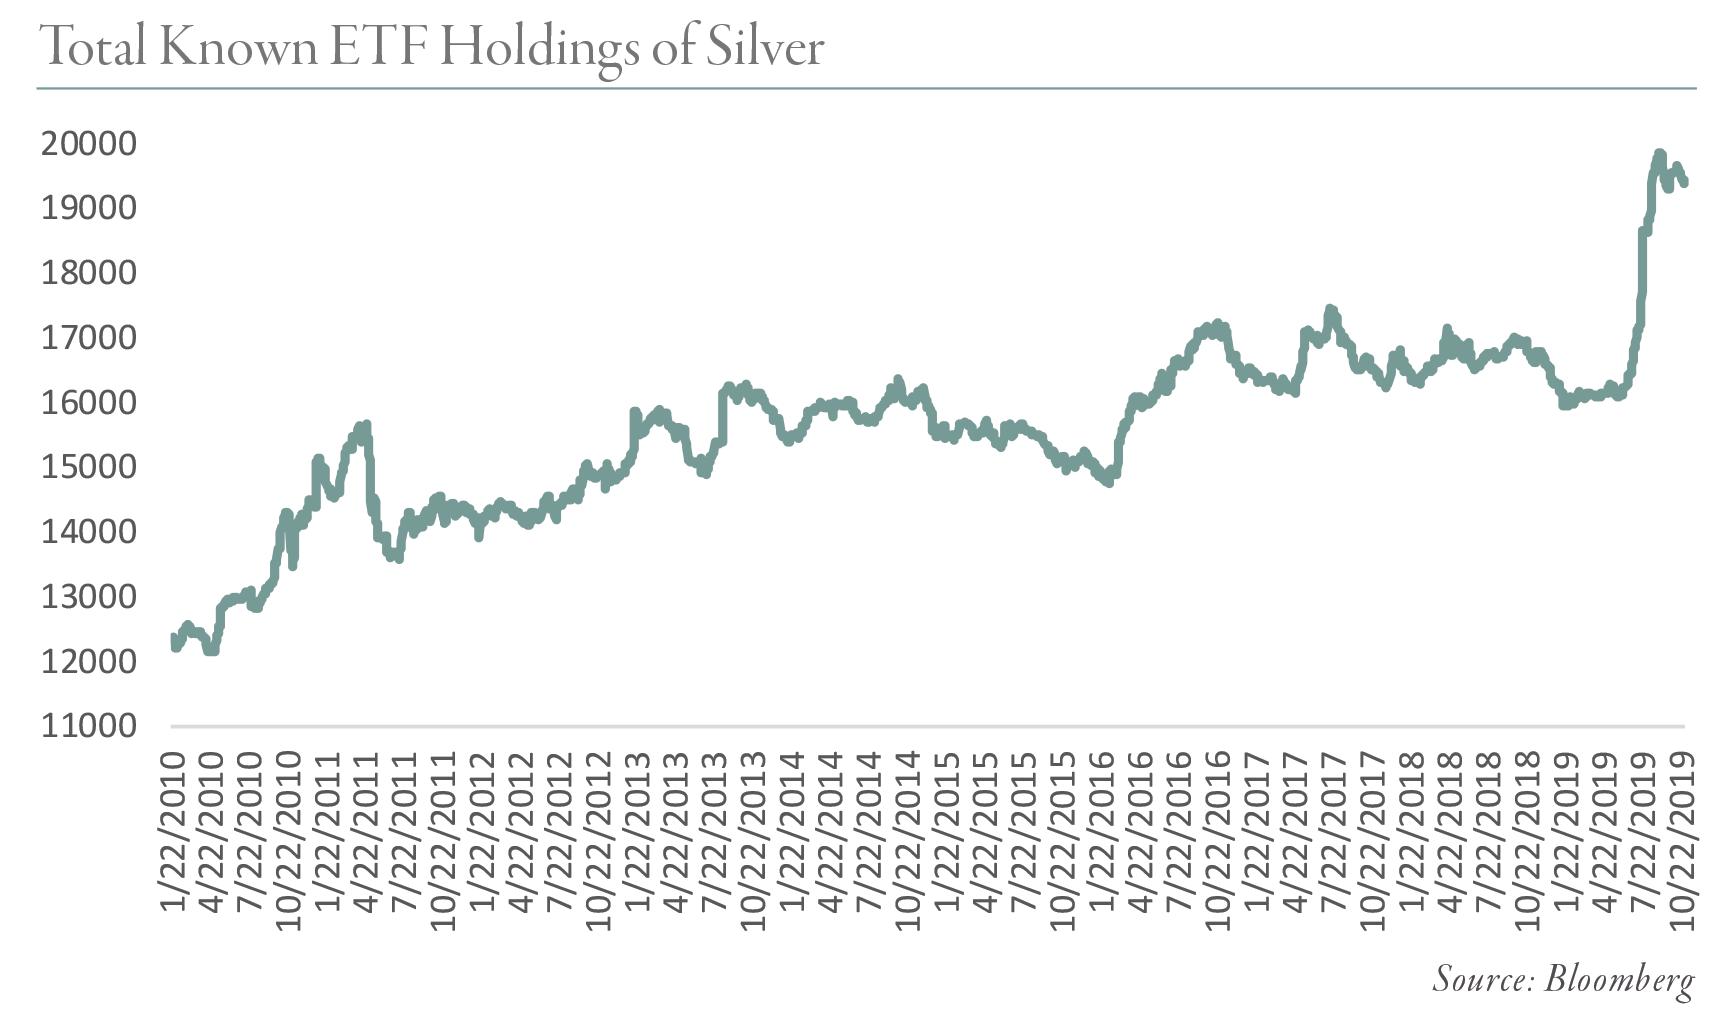 "Total-Conocido-ETF-Holdings-of-Silver ""ancho ="" 600 ""estilo ="" ancho: 600px; bloqueo de pantalla; margen: 10px auto 0px; ""srcset ="" https://blog.gorozen.com/hs-fs/hubfs/Blog%20Images/Total-Known-ETF-Holdings-of-Silver.png?width=300&name=Total- Conocido-ETF-Holdings-of-Silver.png 300w, https://blog.gorozen.com/hs-fs/hubfs/Blog%20Images/Total-Known-ETF-Holdings-of-Silver.png?width=600&name = Total-ETF-Holdings-of-Silver.png 600w, https://blog.gorozen.com/hs-fs/hubfs/Blog%20Images/Total-Known-ETF-Holdings-of-Silver.png? width = 900 & name = Total-Known-ETF-Holdings-of-Silver.png 900w, https://blog.gorozen.com/hs-fs/hubfs/Blog%20Images/Total-Known-ETF-Holdings-of-Silver .png? width = 1200 & name = Total-Known-ETF-Holdings-of-Silver.png 1200w, https://blog.gorozen.com/hs-fs/hubfs/Blog%20Images/Total-Known-ETF-Holdings- of-Silver.png? width = 1500 & name = Total-Known-ETF-Holdings-of-Silver.png 1500w, https://blog.gorozen.com/hs-fs/hubfs/Blog%20Images/Total-Known-ETF -Holdings-of-Silver.png? Ancho = 1800 & name = ETF-Total-Holdings-of-Silver.png 1800w ""tamaños ="" (ancho máximo: 600px) 100vw, 600px"